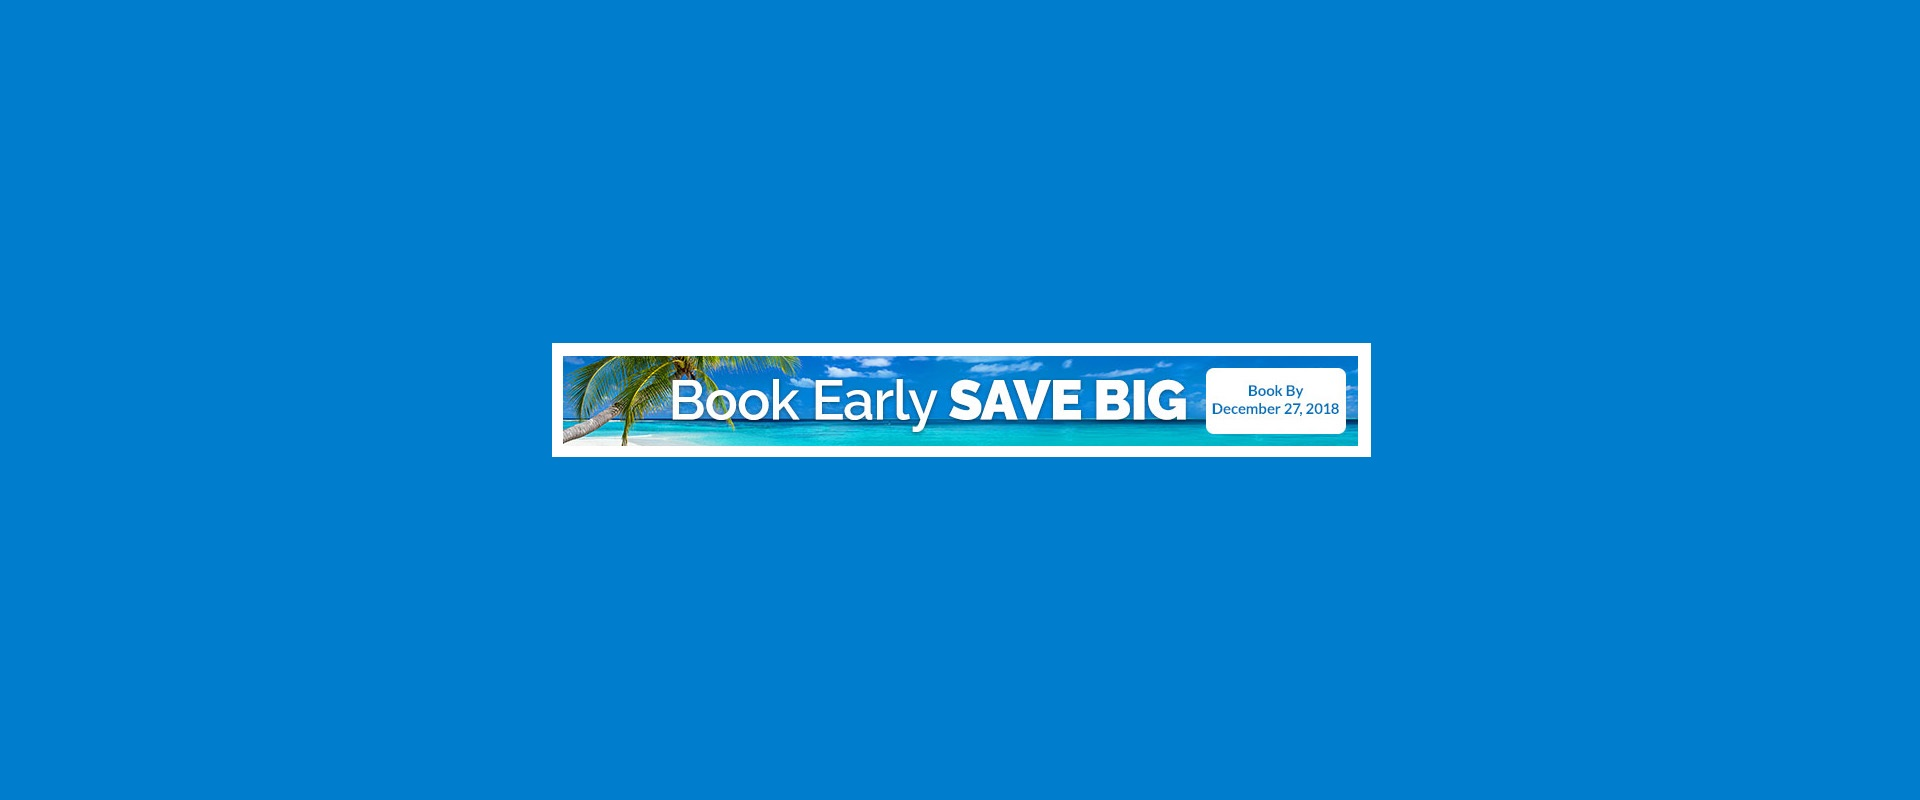 Book-Early-Save-Big-Header